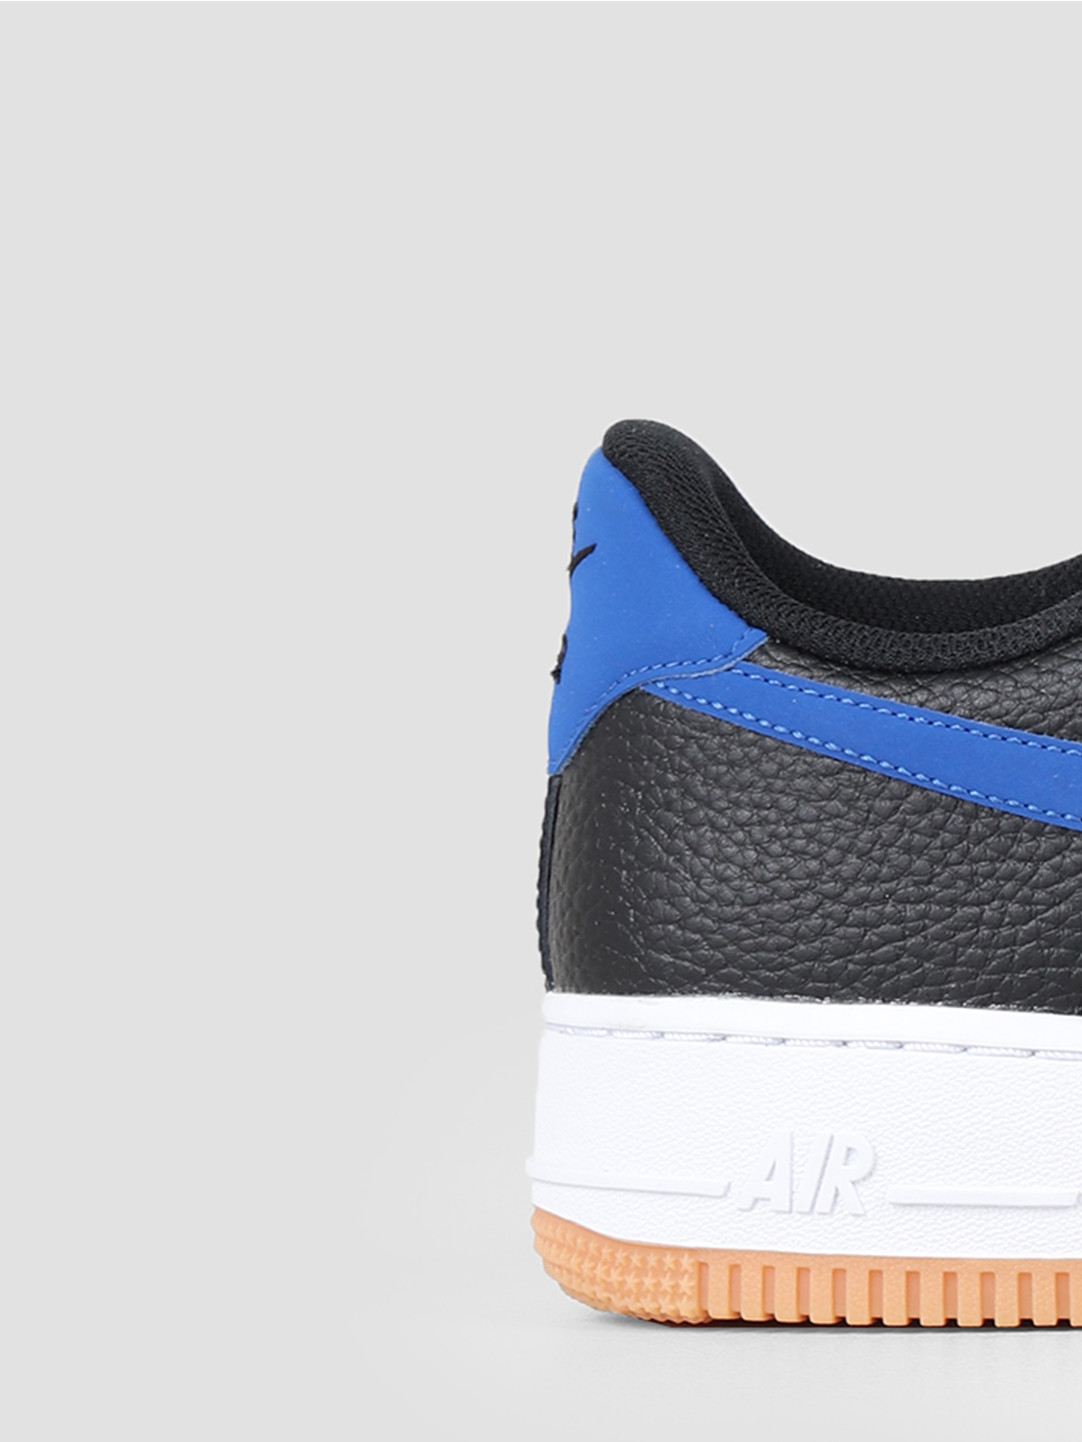 Nike Nike Air Force 1 07 2 Black Game Royal White Gum Med Brown CI0057-001